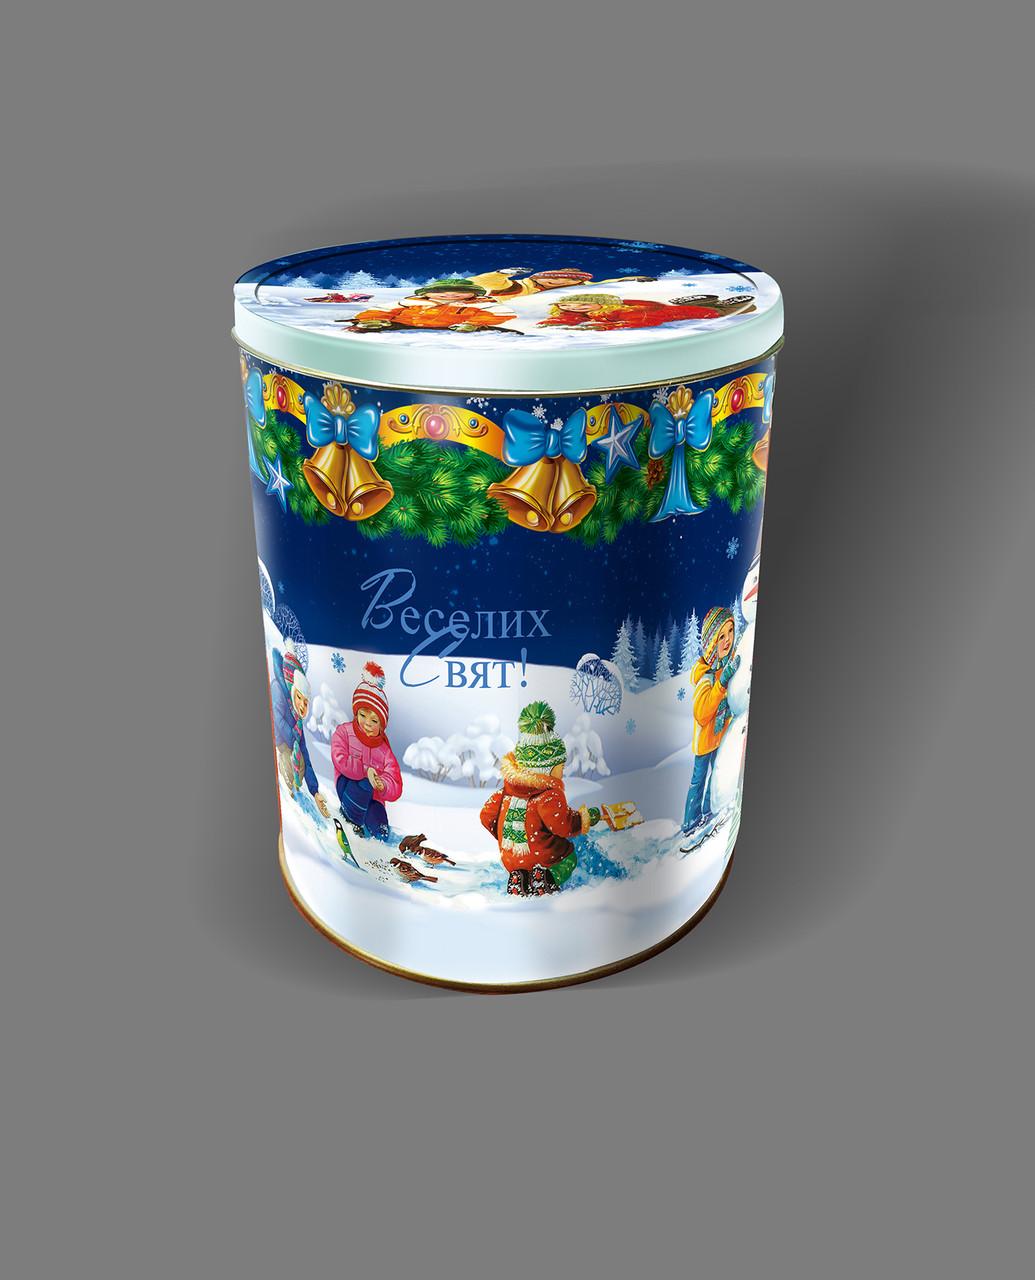 "Новогодняя коробка - тубус  жестяная  ""Волшебство рождества""  21-М4*2 на 1000 -1200 грамм"